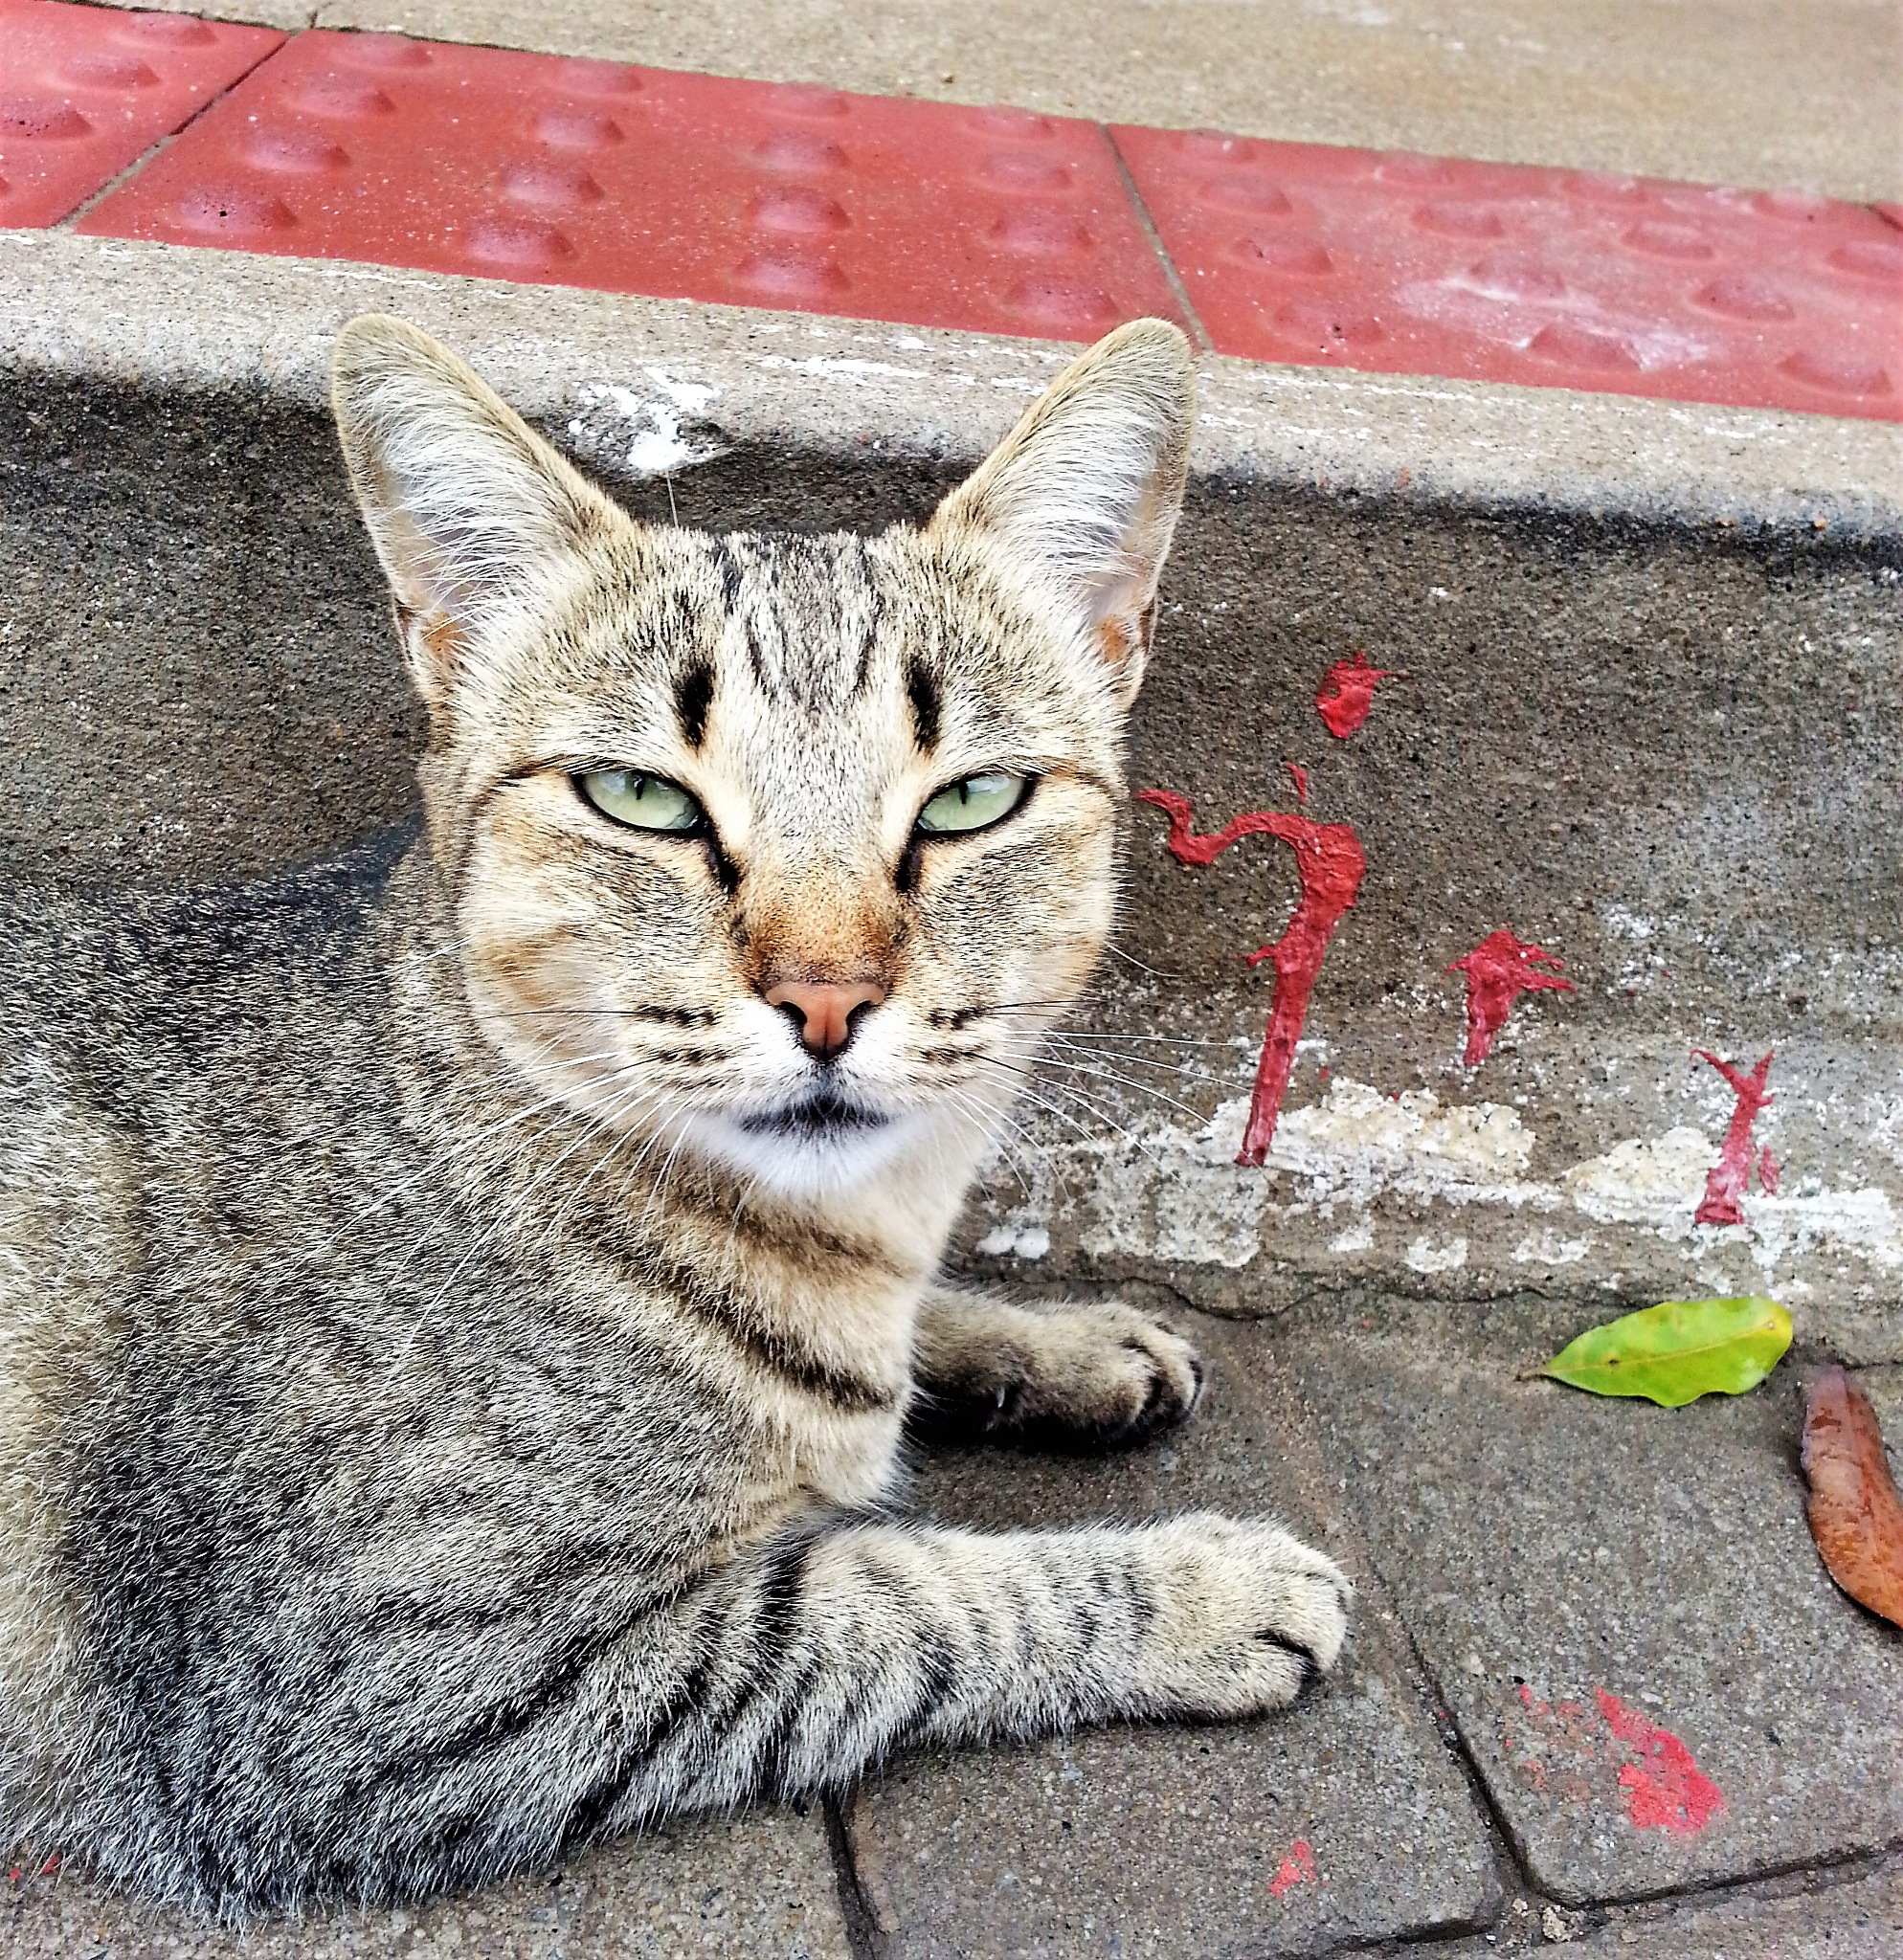 #Wild cat by mário lellis